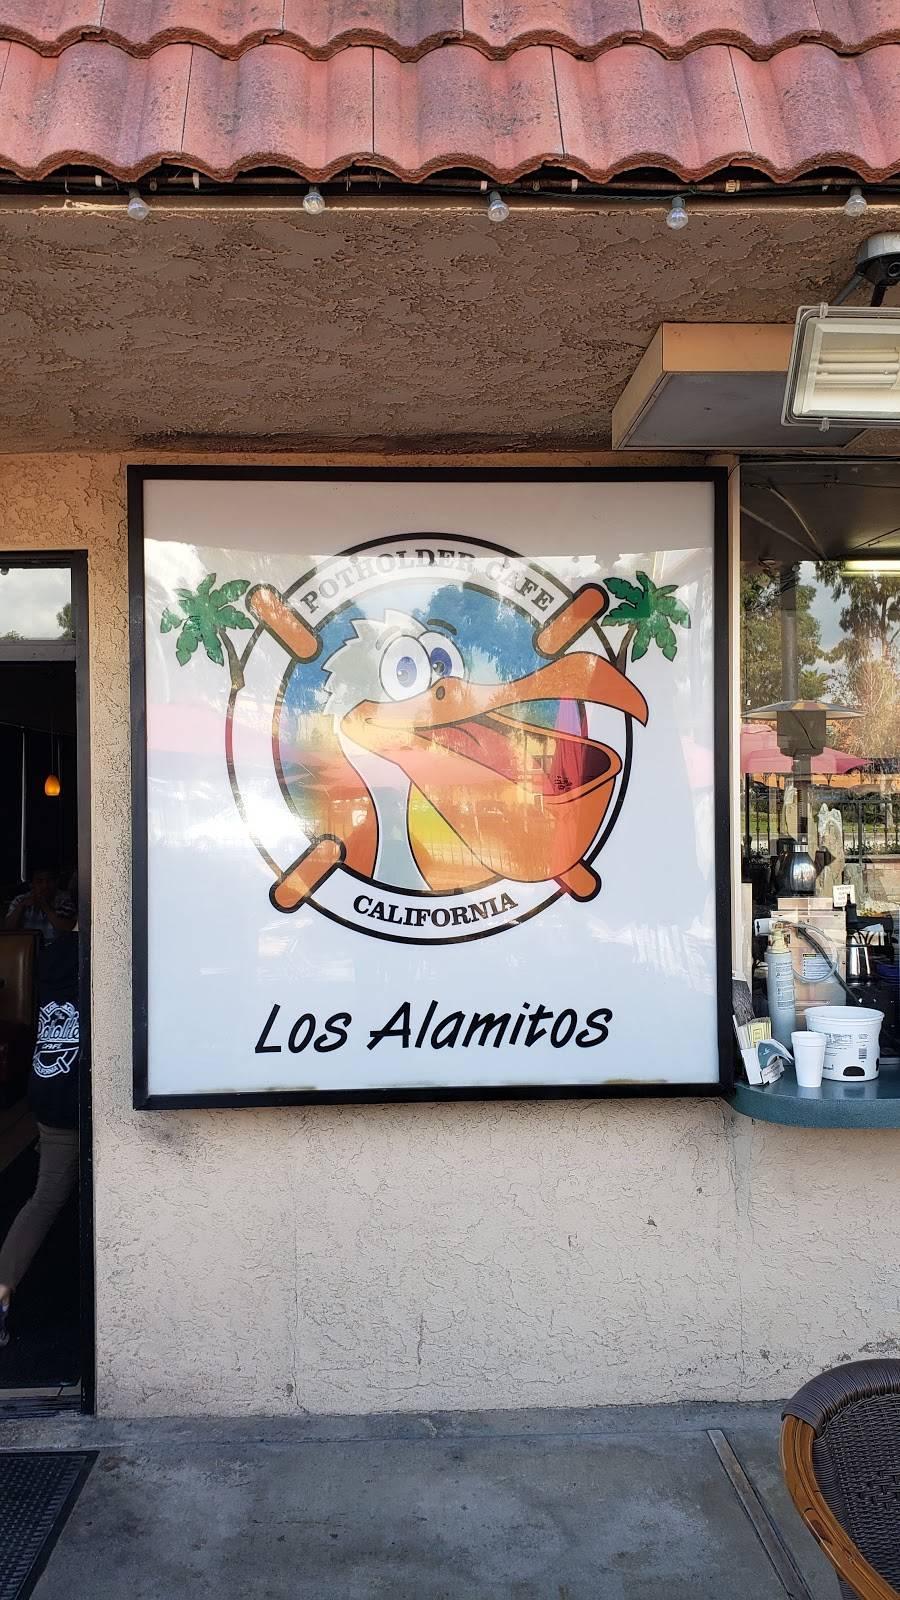 The Potholder Cafe P4 | restaurant | 5008 Katella Ave, Los Alamitos, CA 90720, USA | 5624311165 OR +1 562-431-1165